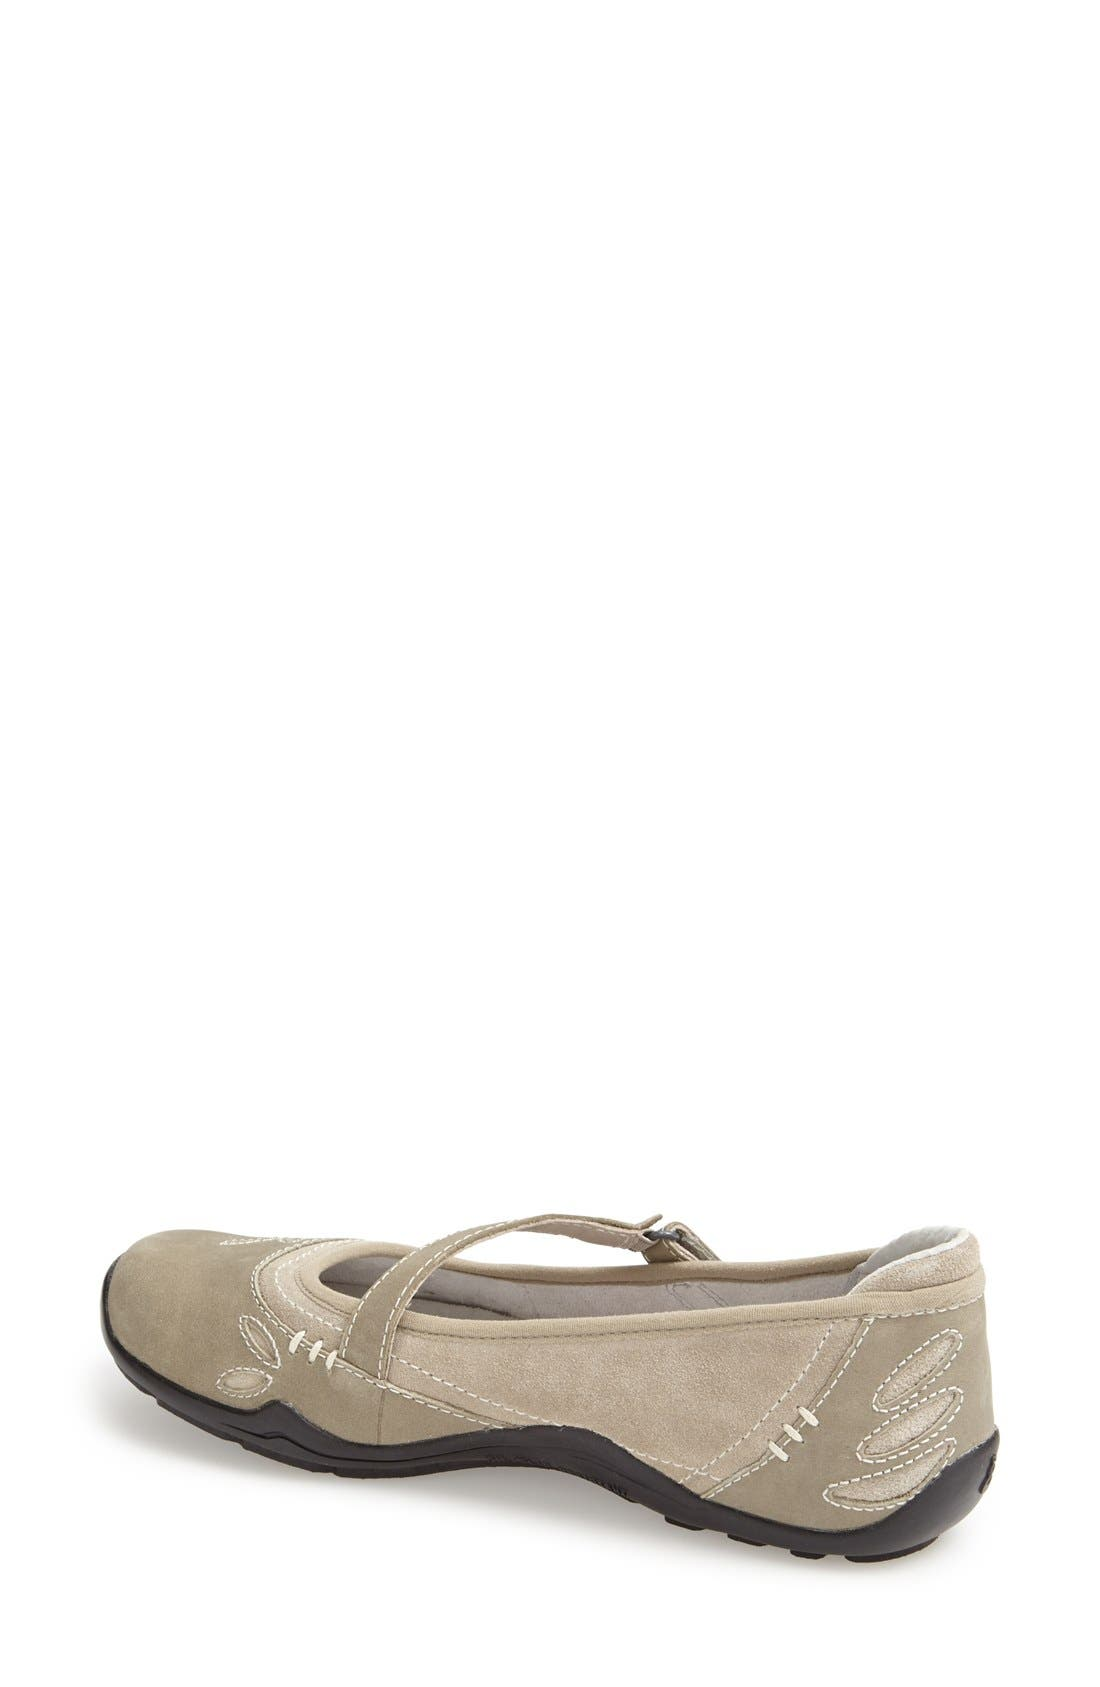 Alternate Image 2  - Ahnu 'Gracie Pro' Leather Flat (Women)